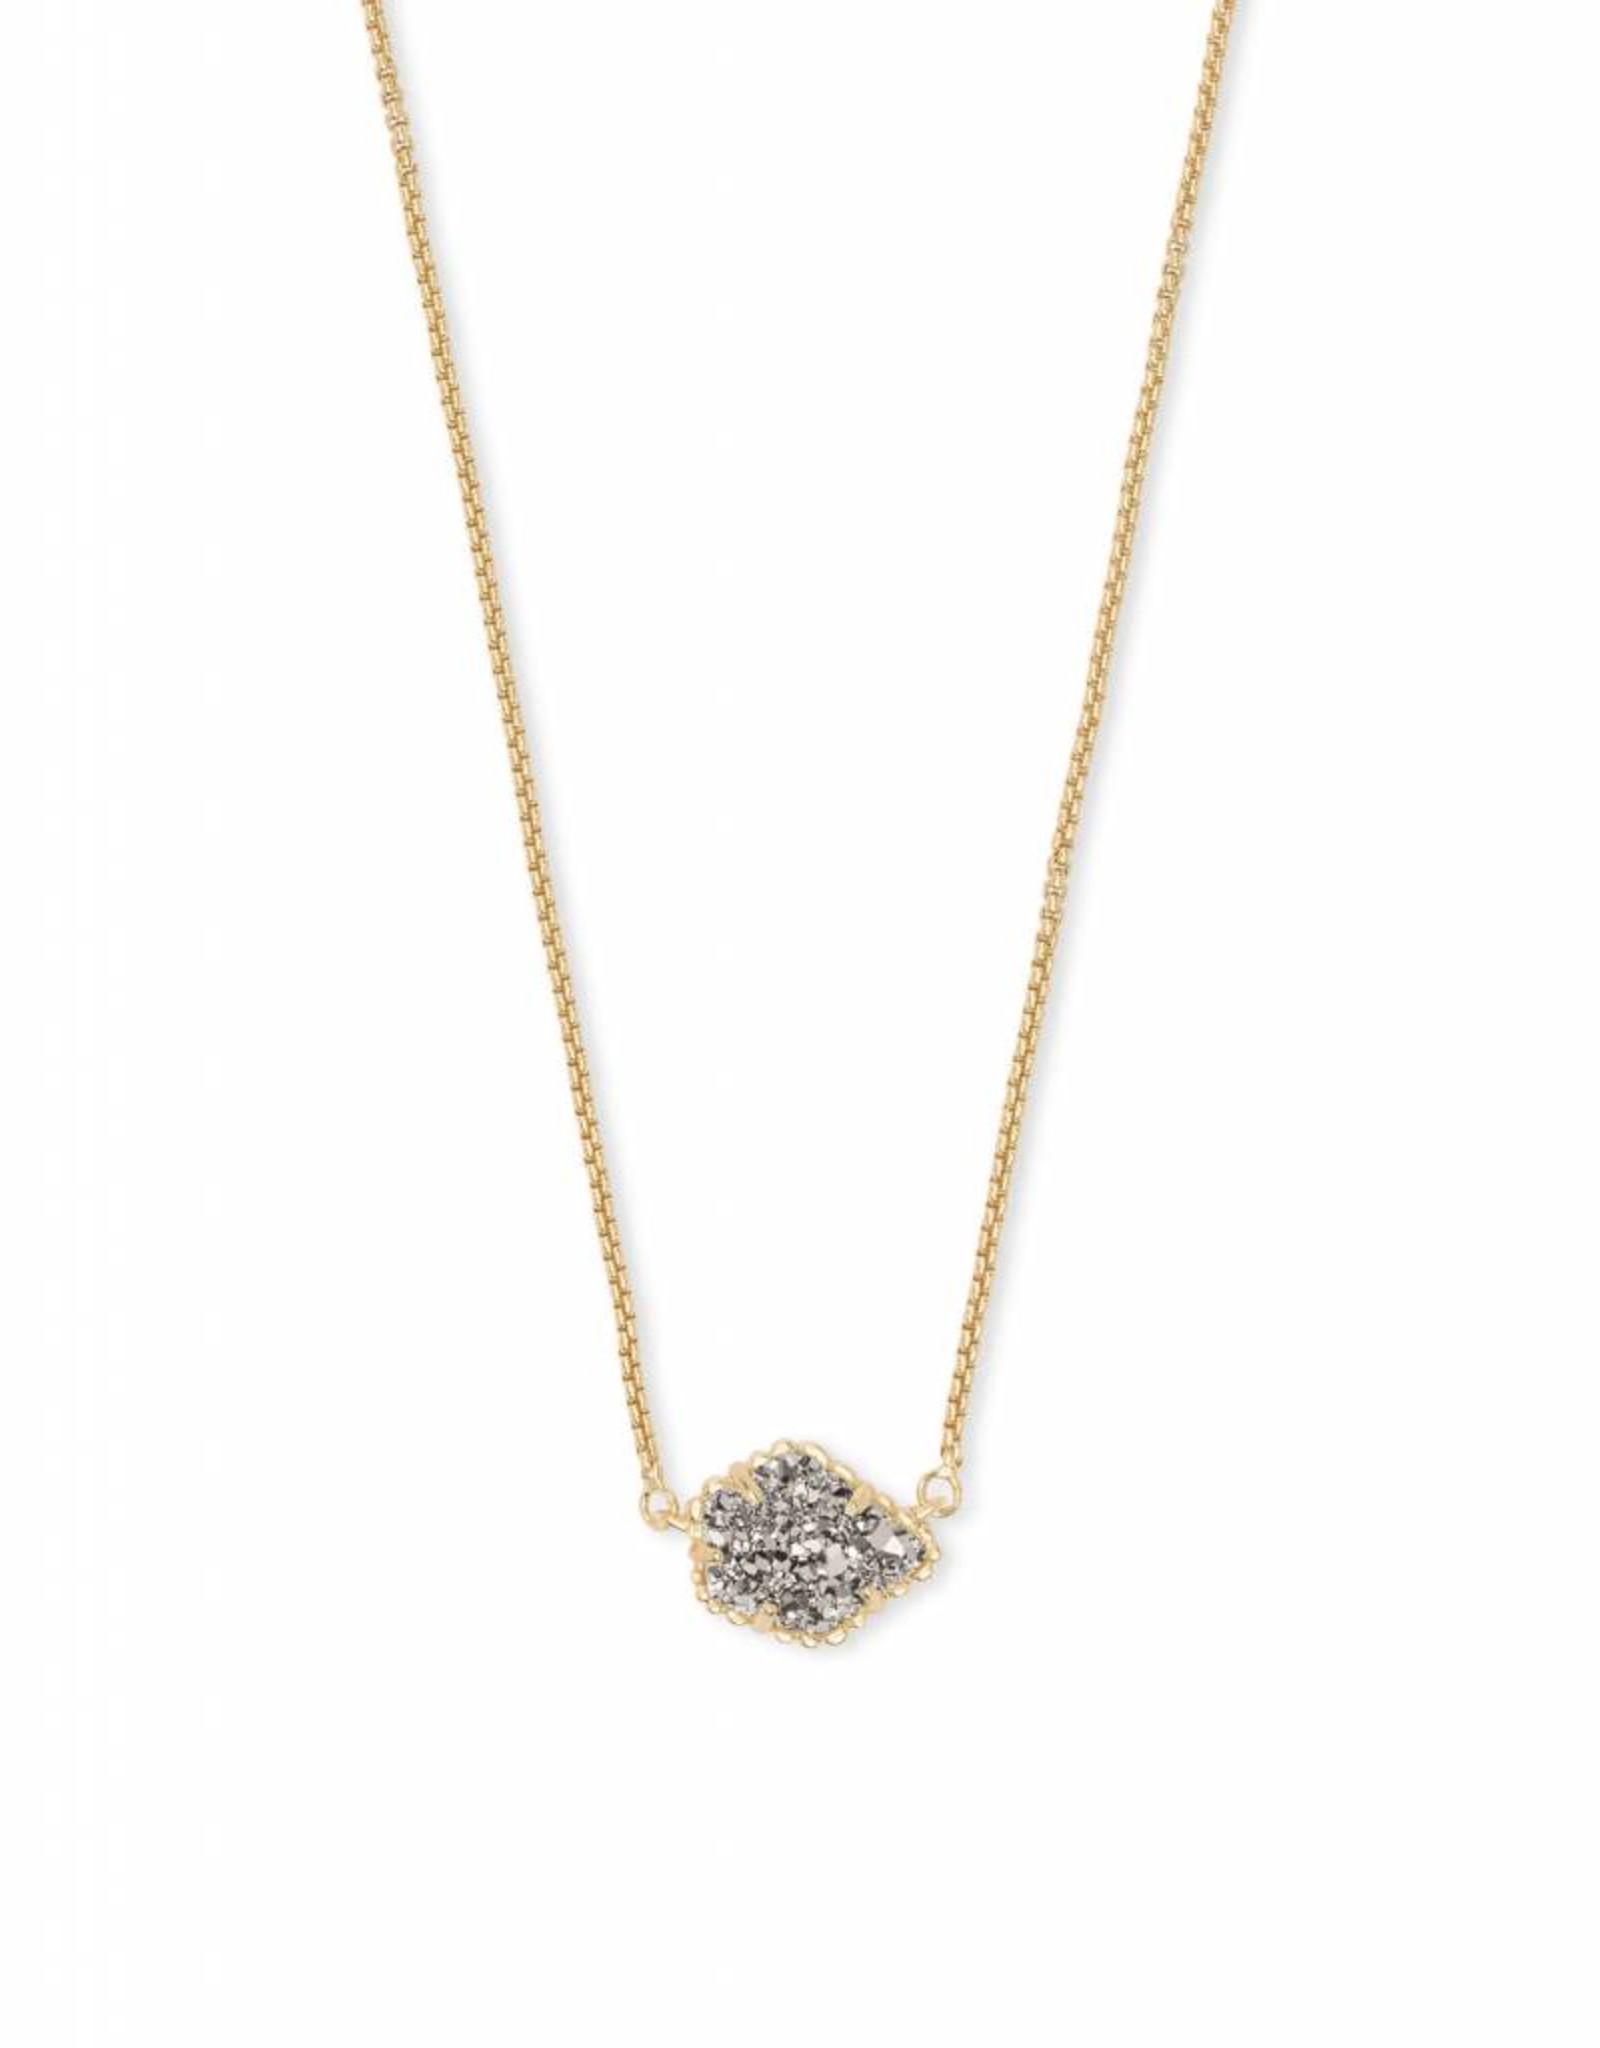 Kendra Scott Kendra Scott Tess Necklace- Gold